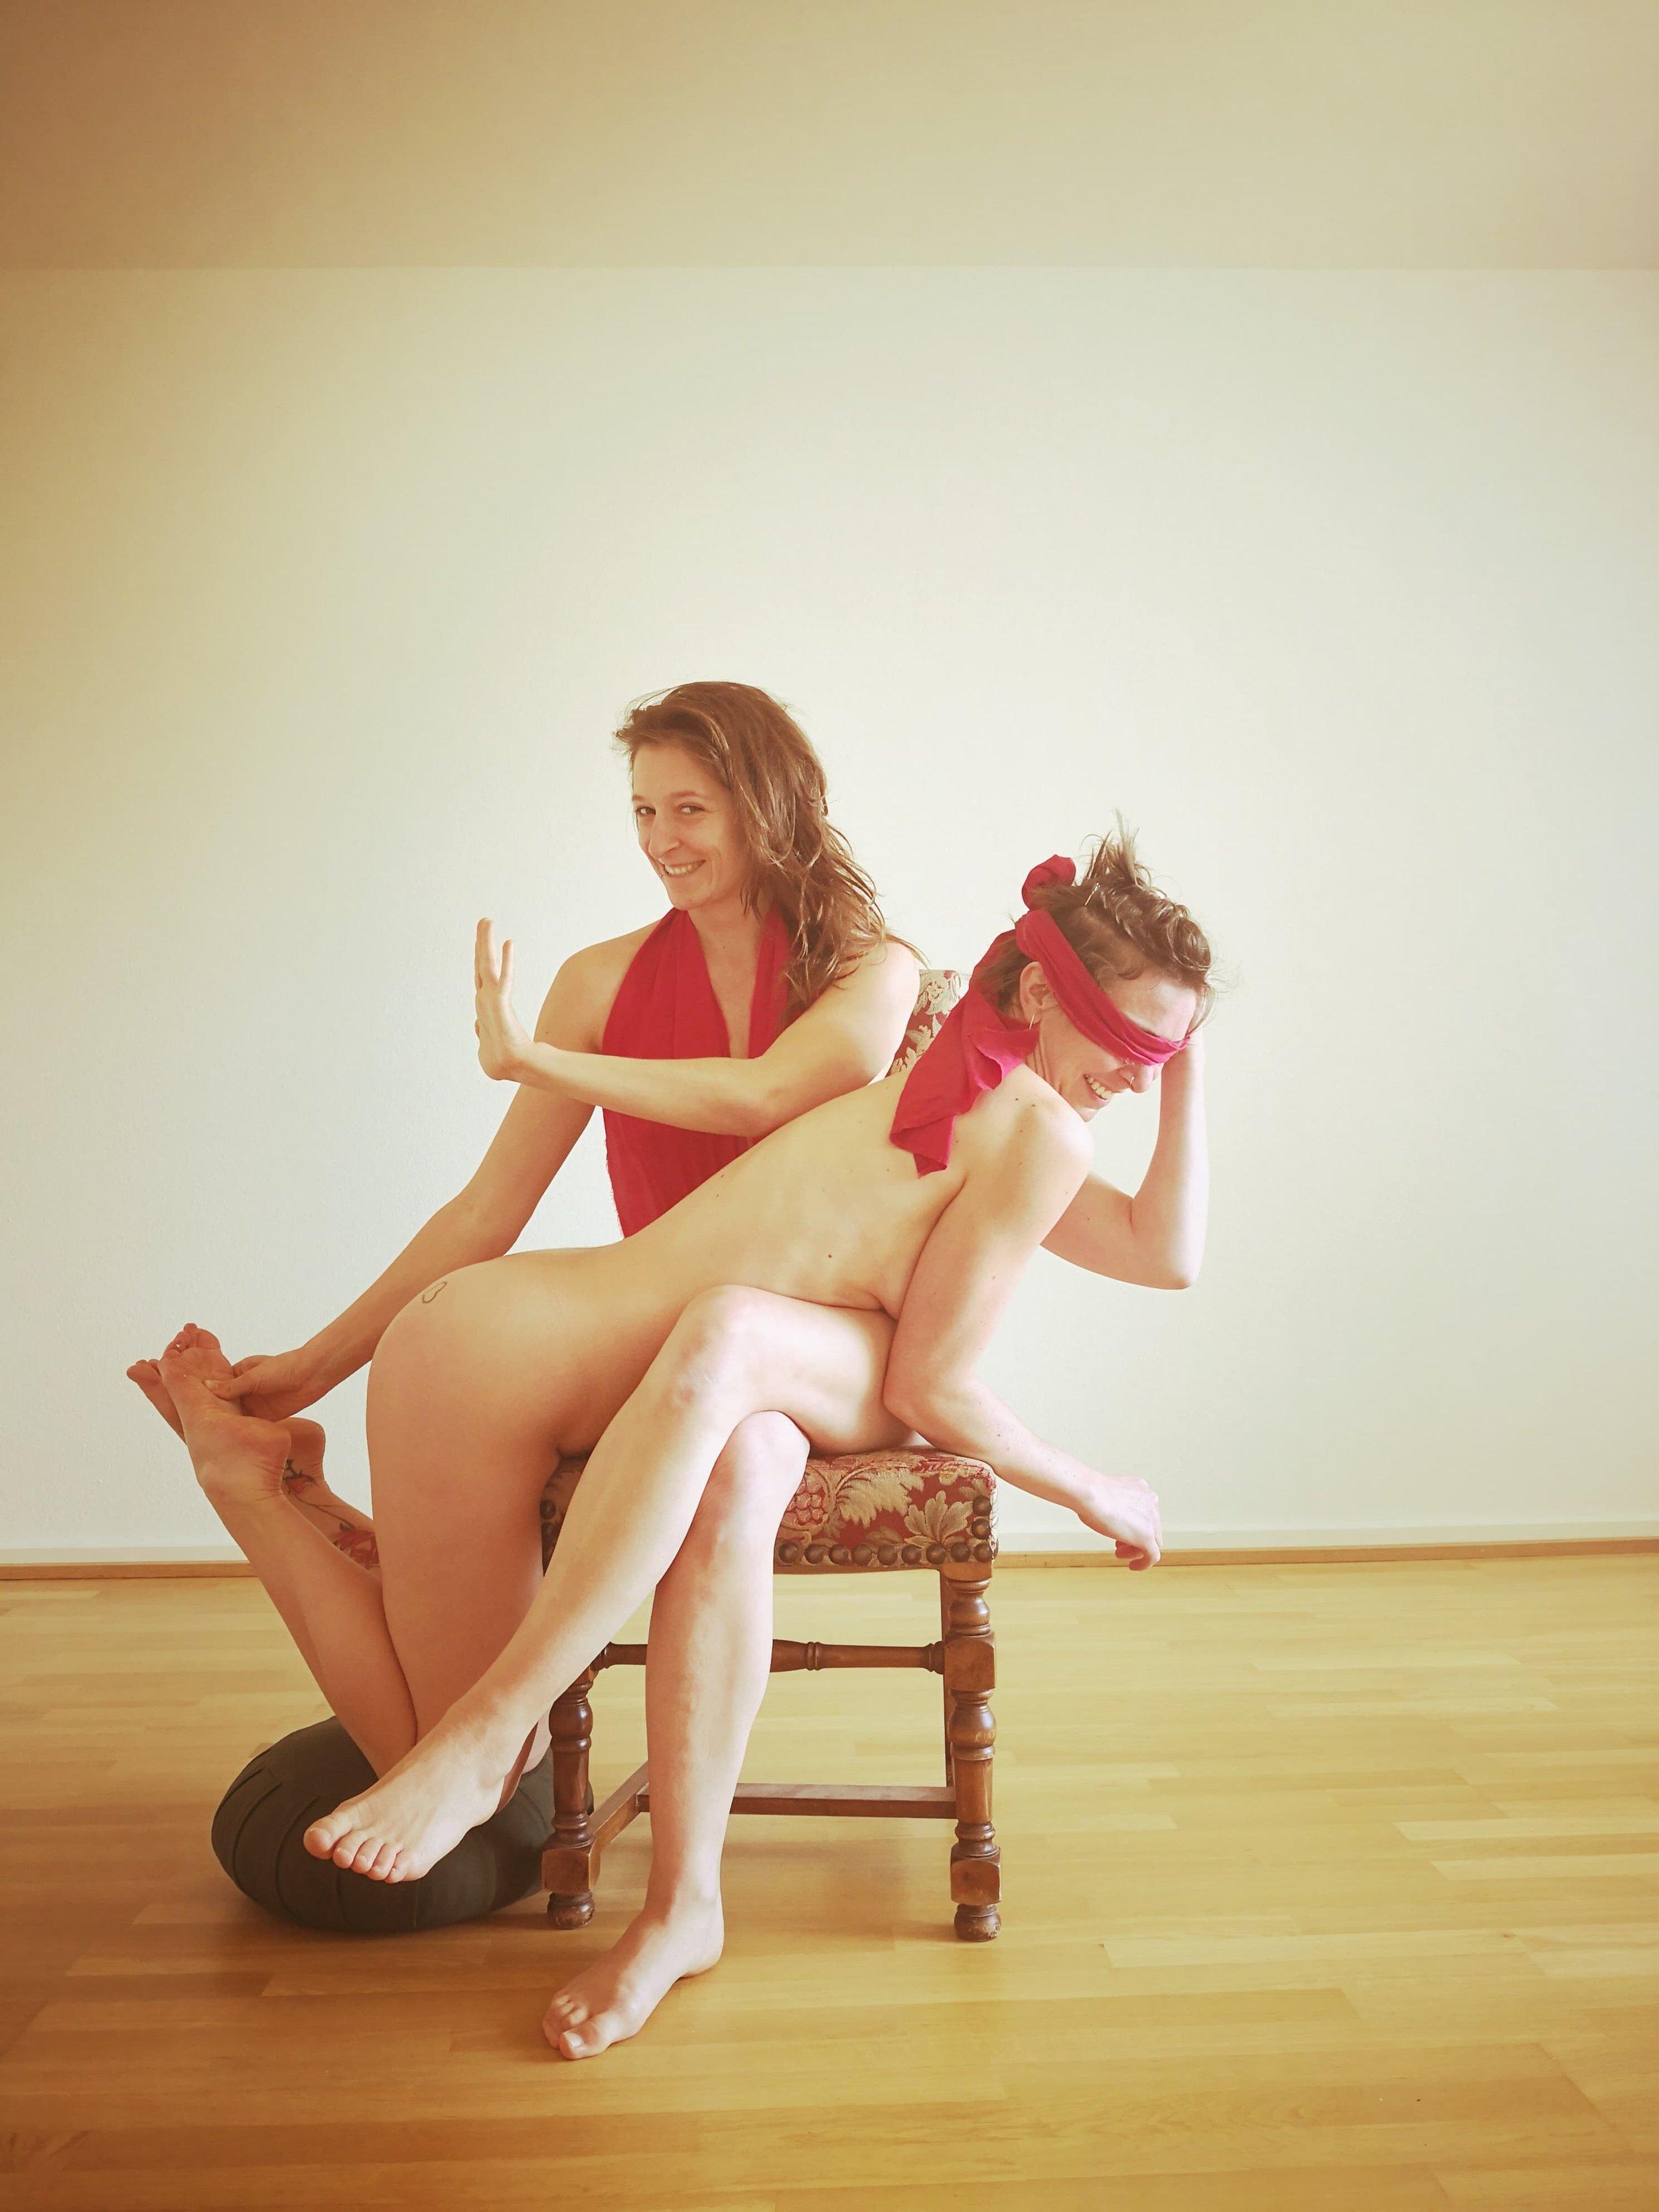 Kinky Wellbeing Massage - on August 31st, Basel, Switzerland